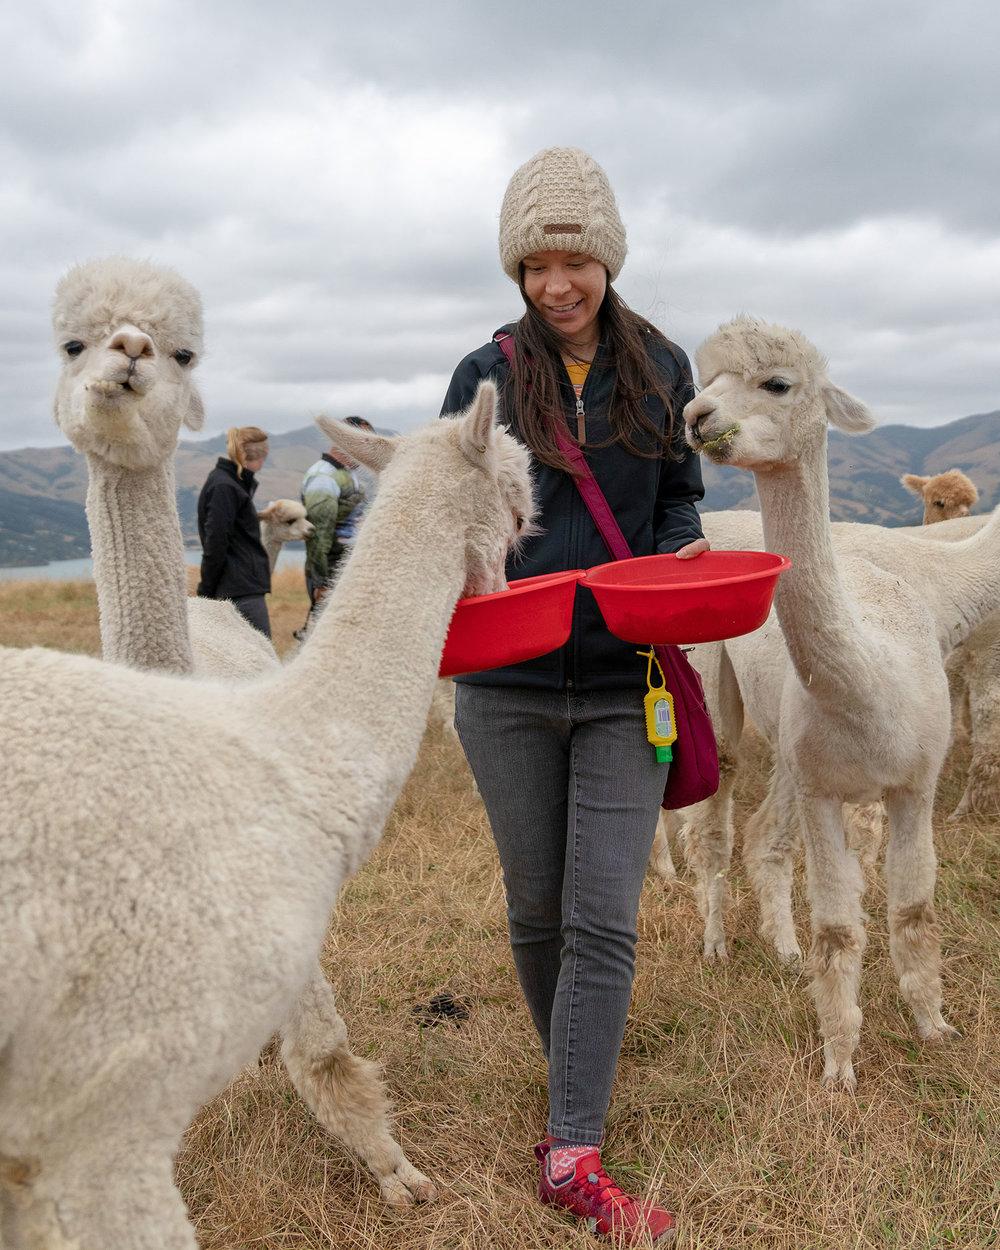 Thaneeya McArdle feeding alpacas at Shamarra Alpaca Farm in Akaroa, New Zealand